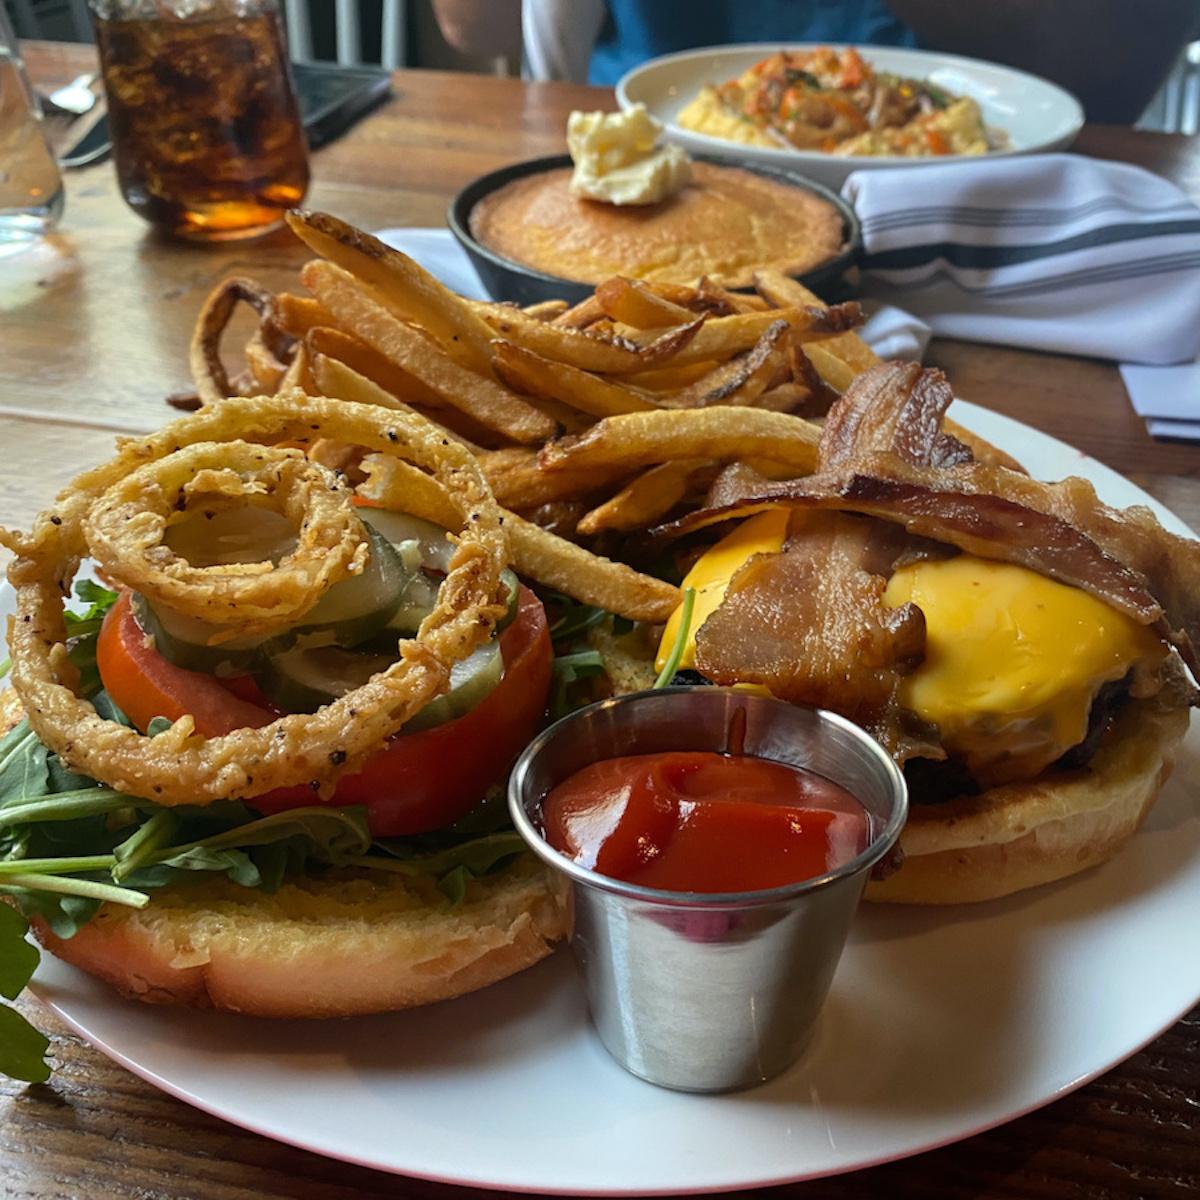 The Appalachian burger